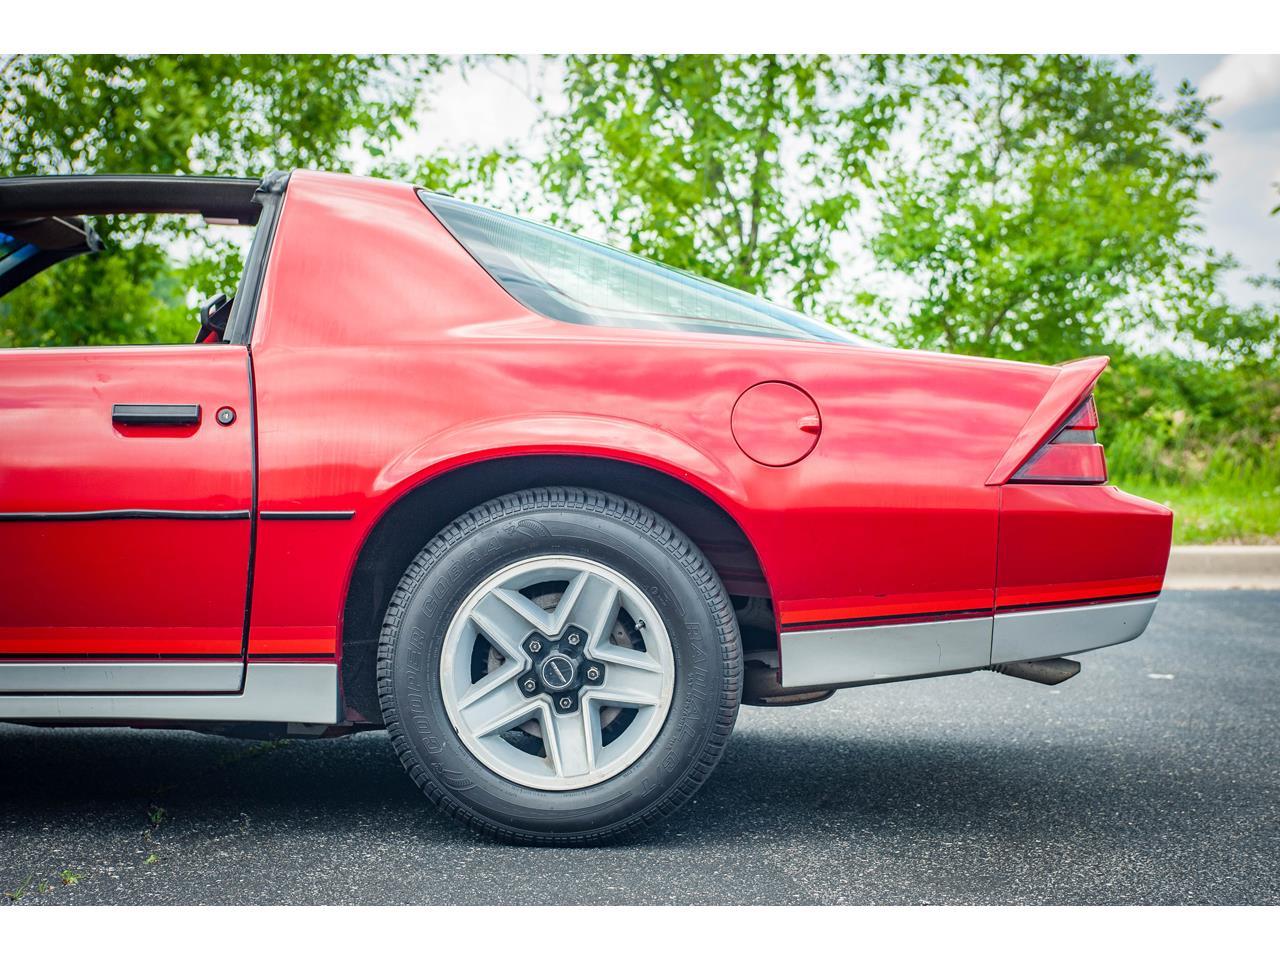 Large Picture of 1984 Camaro located in Illinois - $9,500.00 - QB9Y